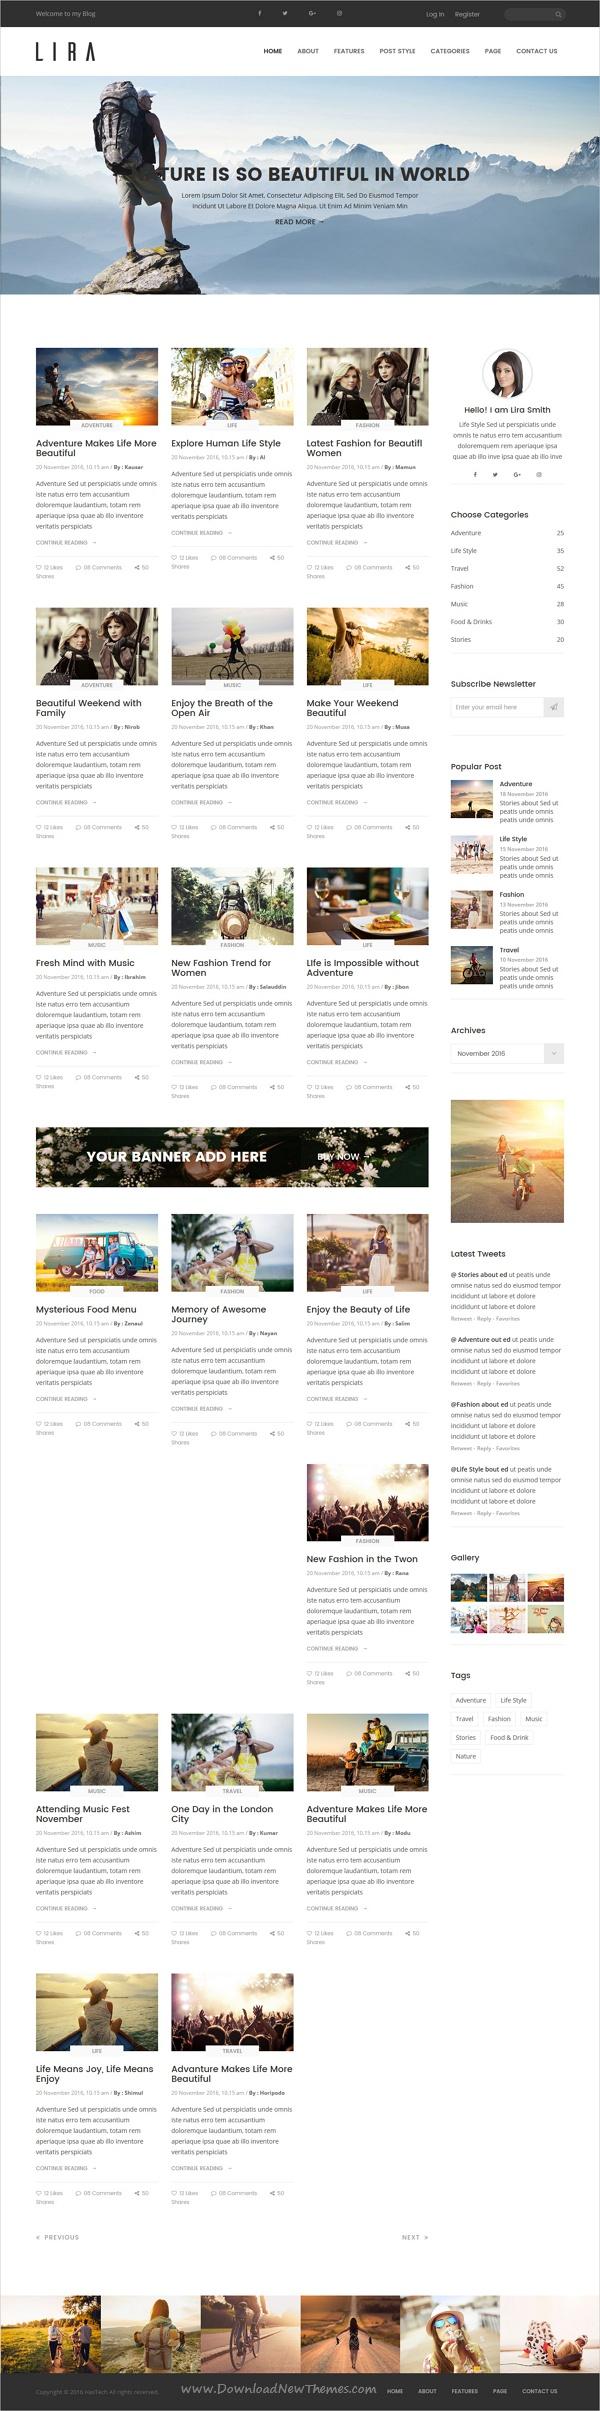 Lira - Affiliate Blog HTML Template | Template